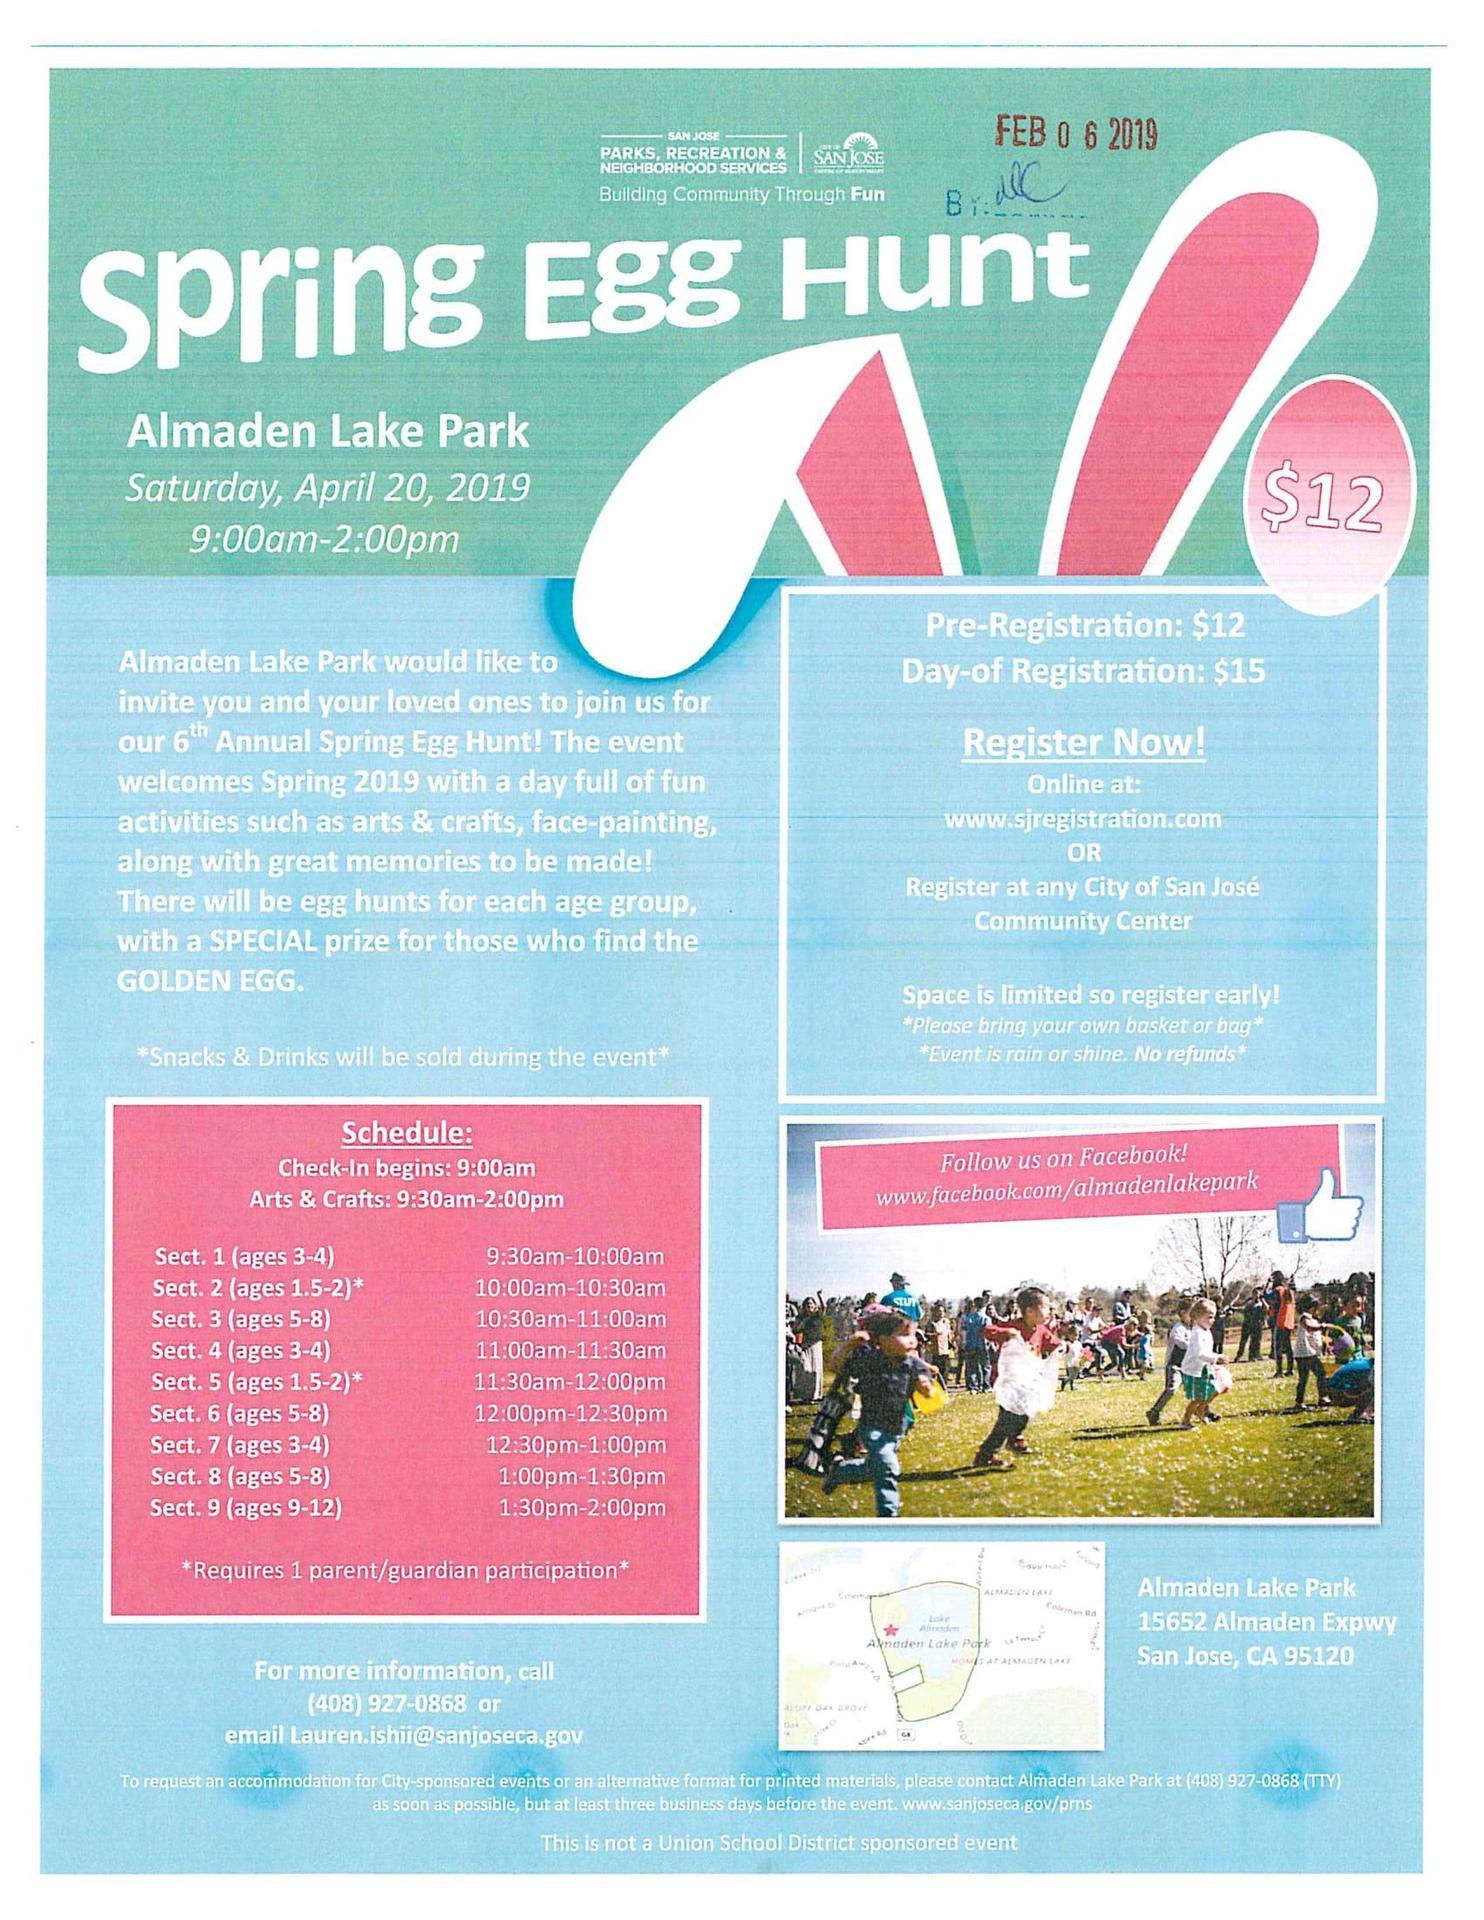 Almaden Lake Park Spring Egg Hunt